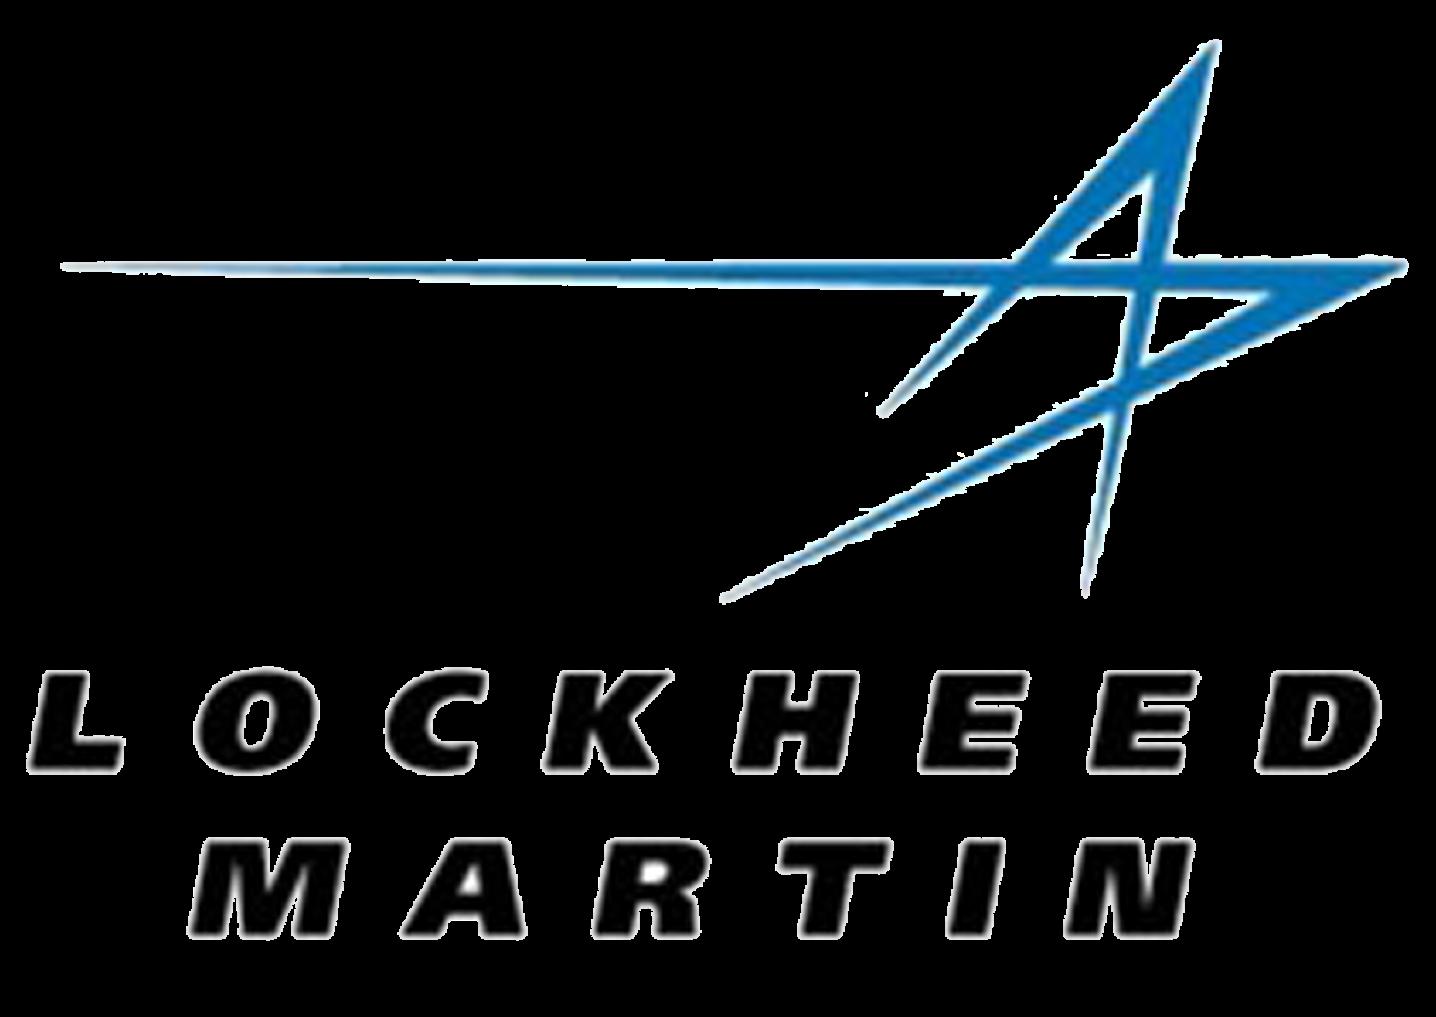 lockheed_martin_logo_partner.png